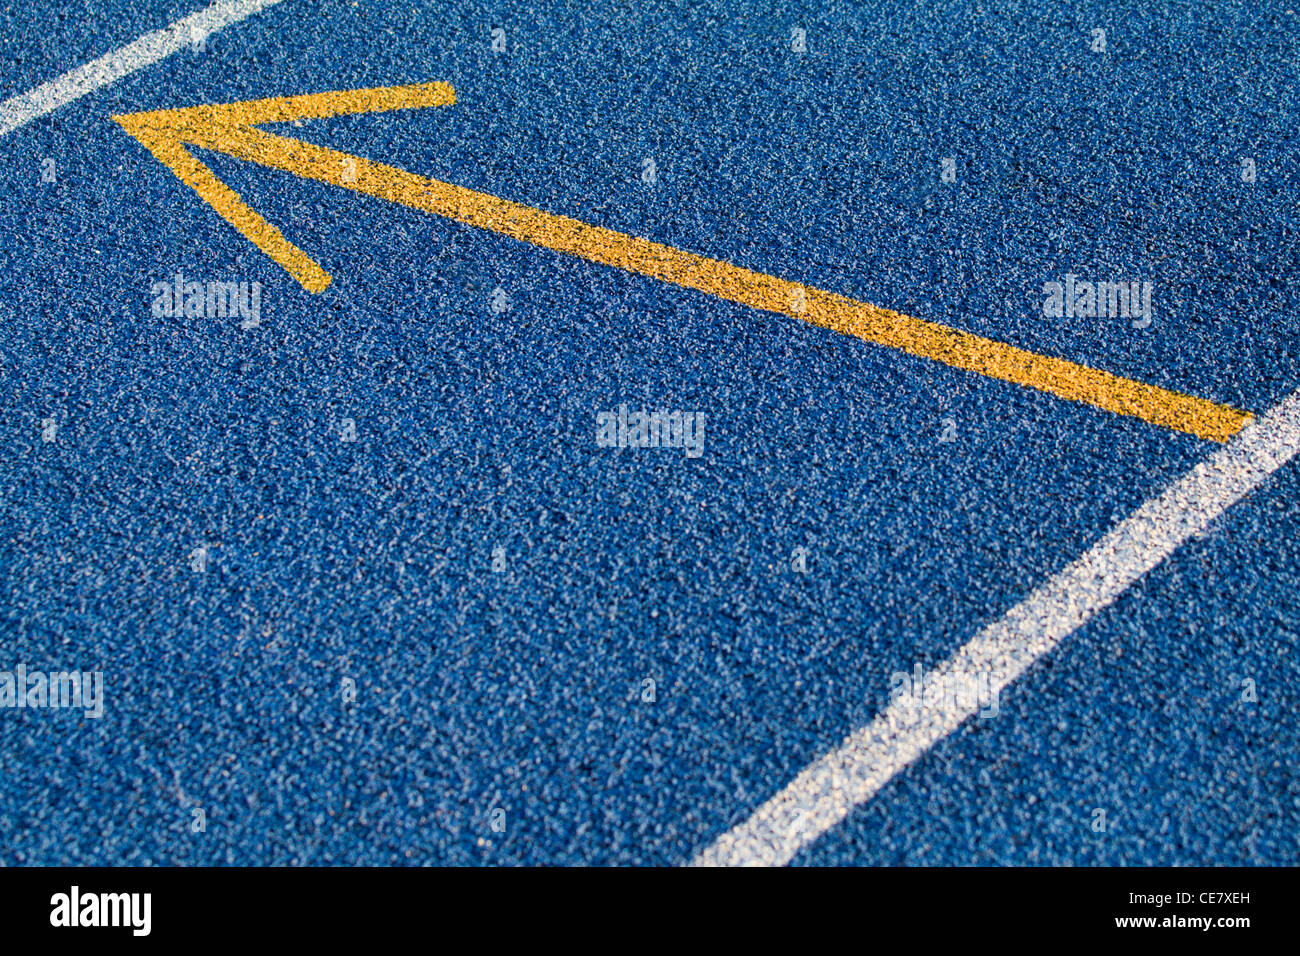 Blue tartan surface with yellow arrow Stock Photo